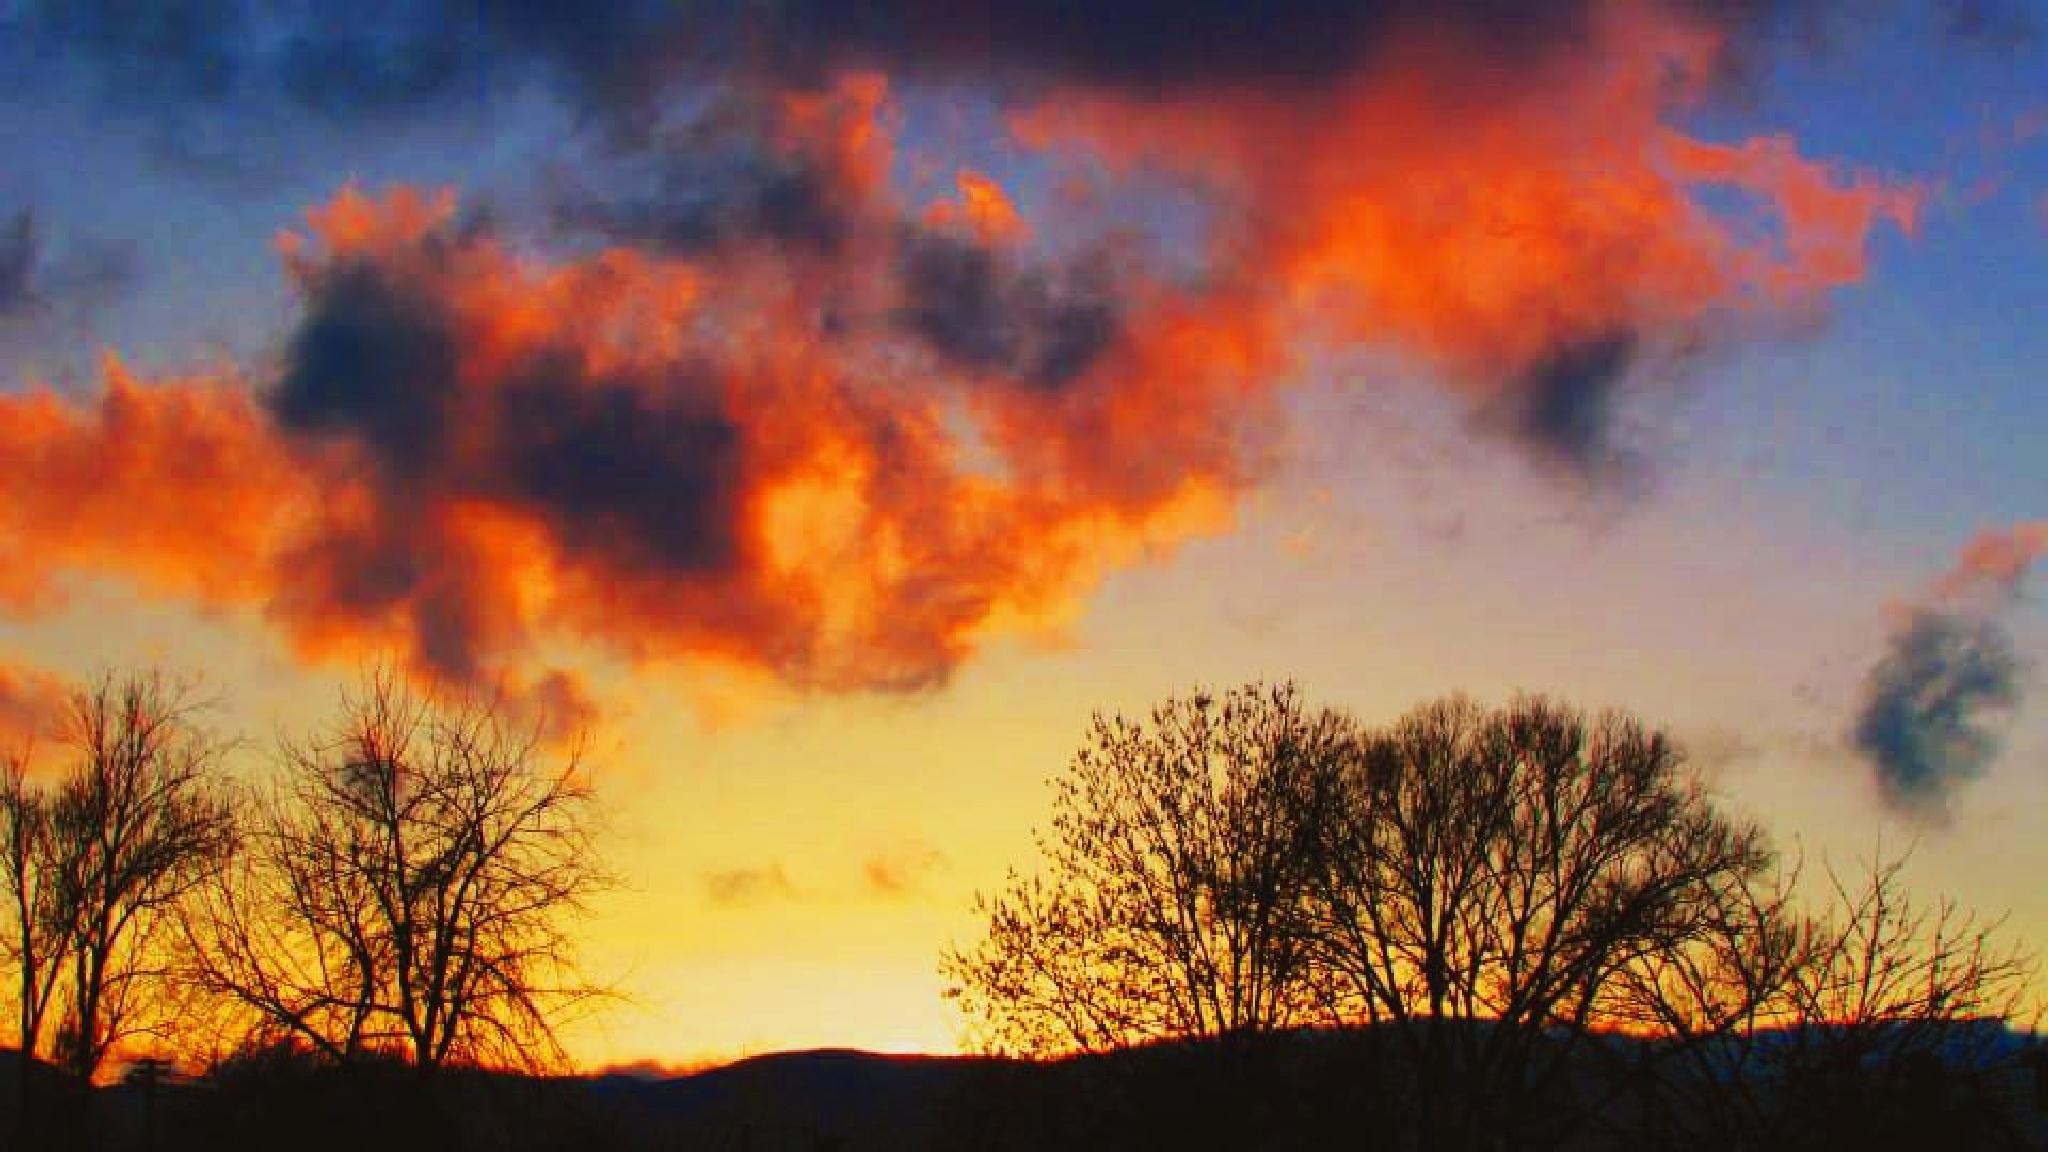 sky on fire by dundacska